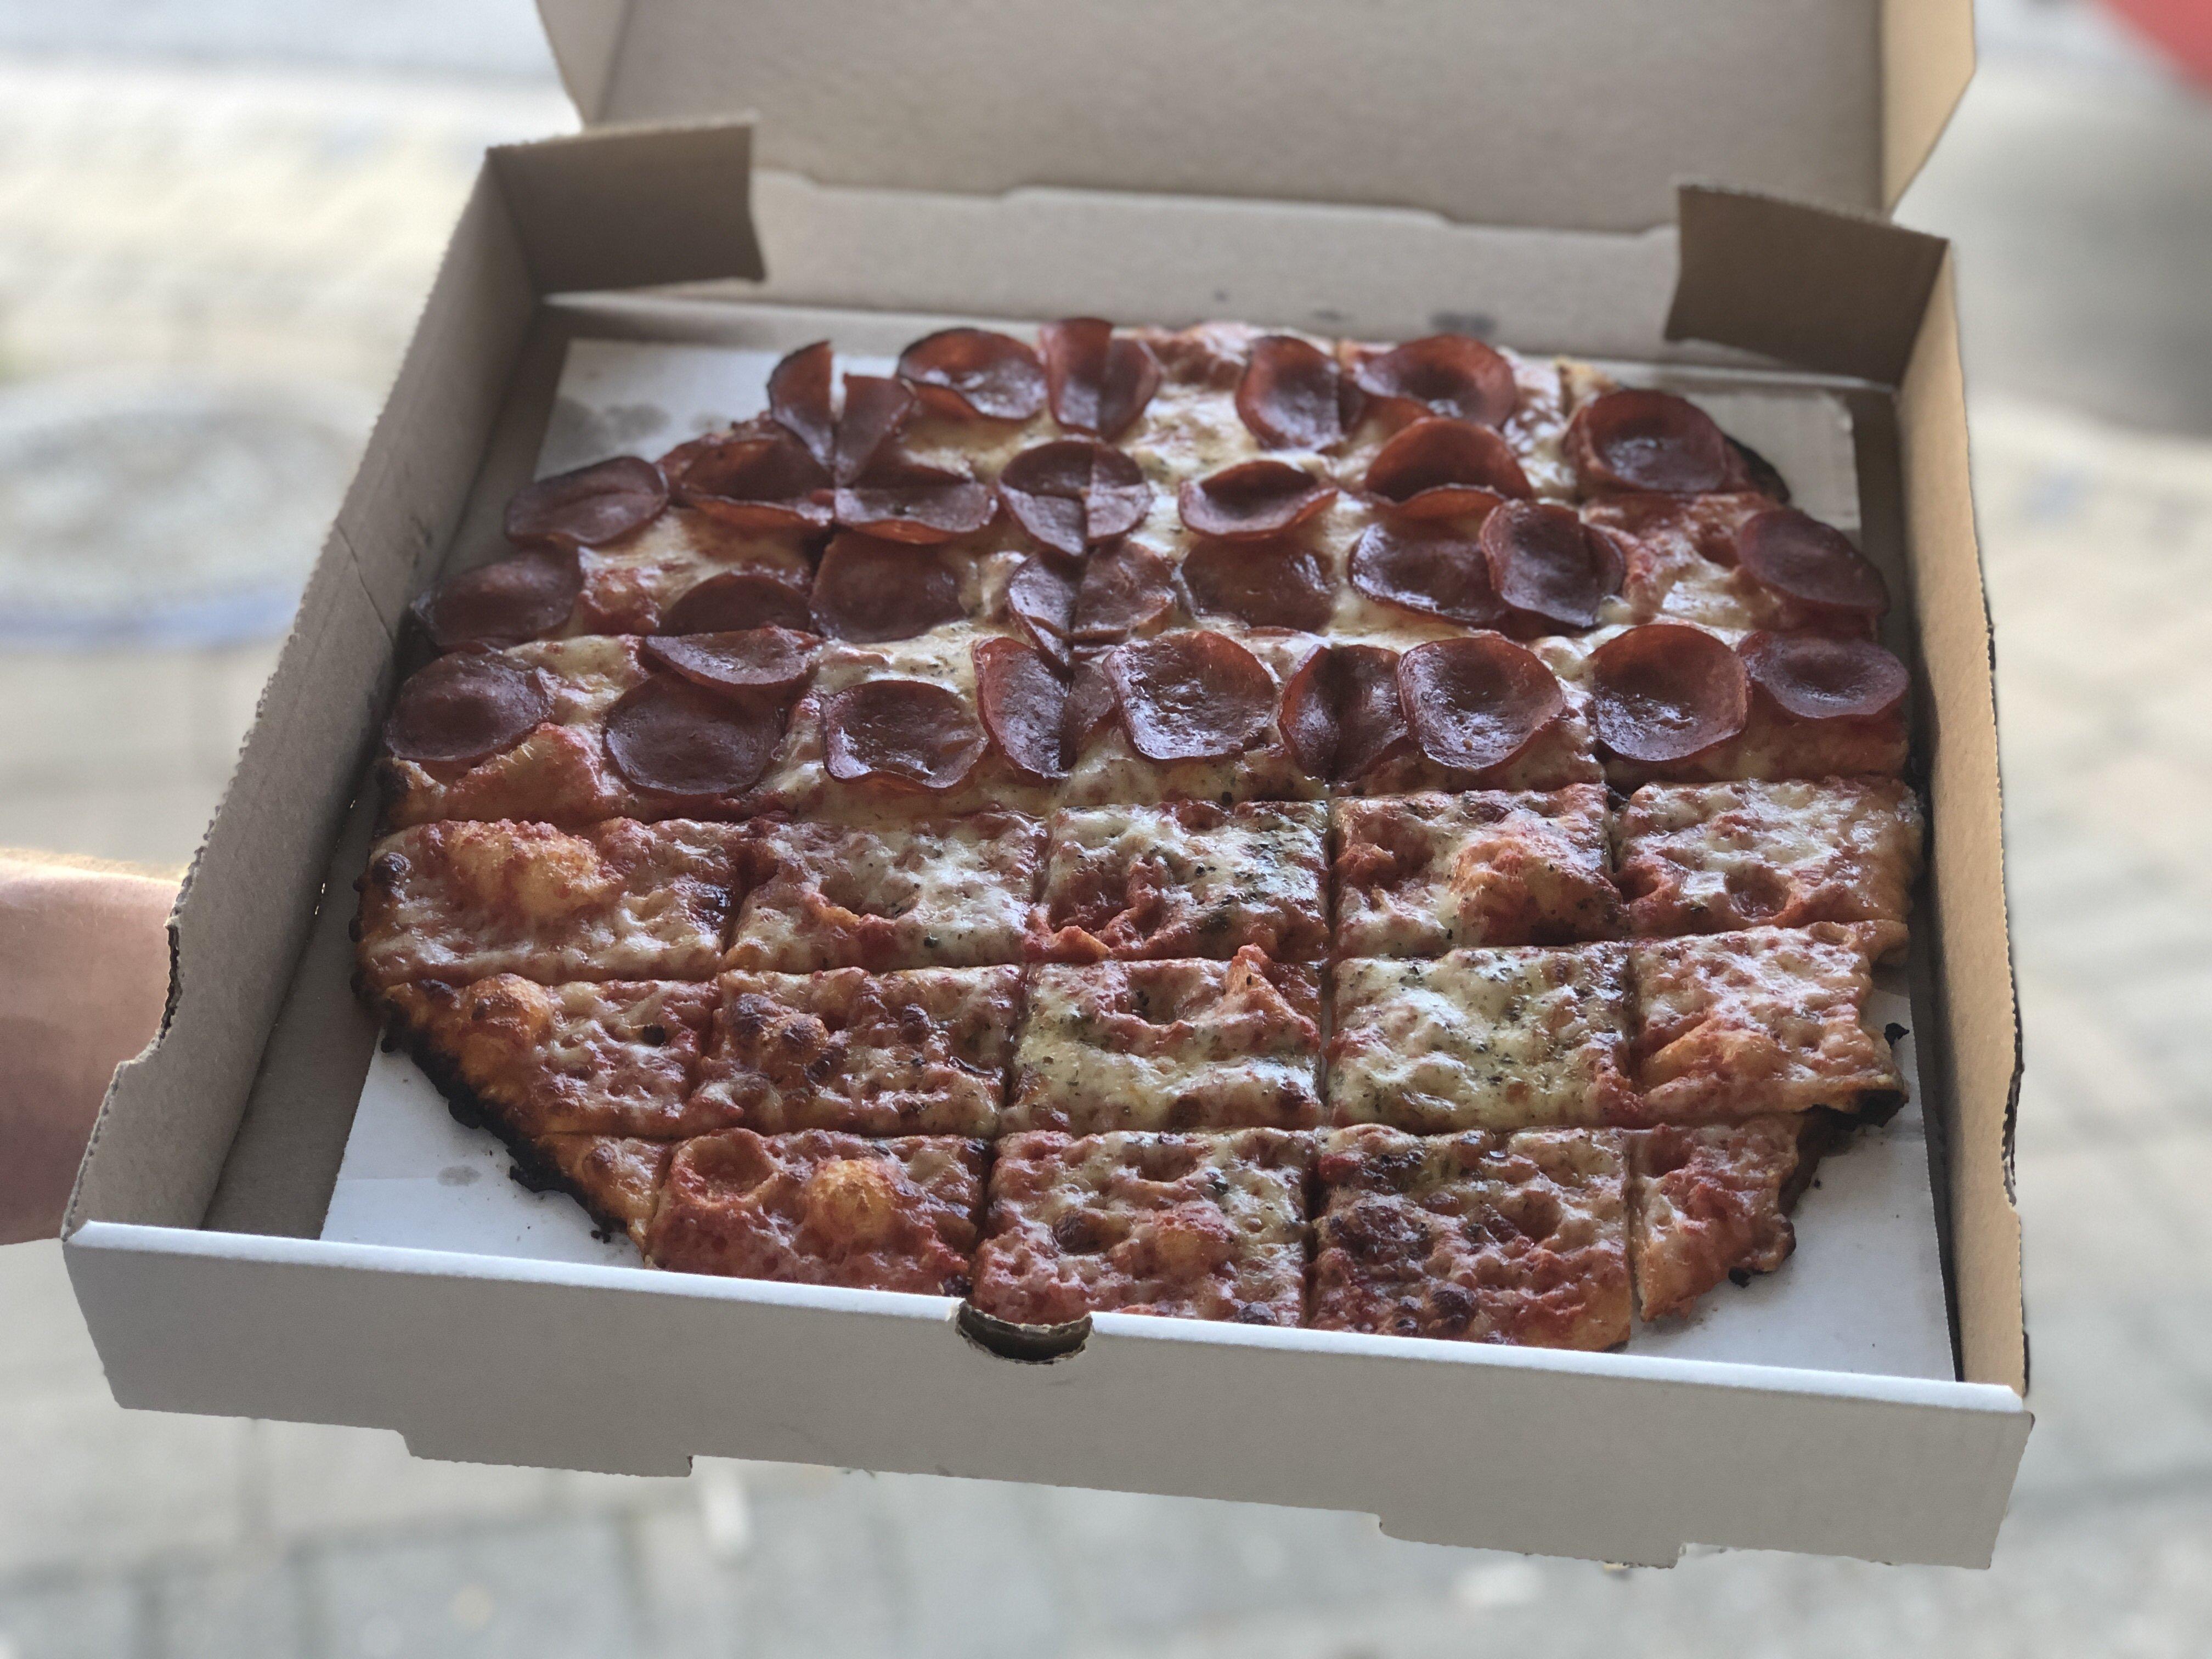 Ron's pizza